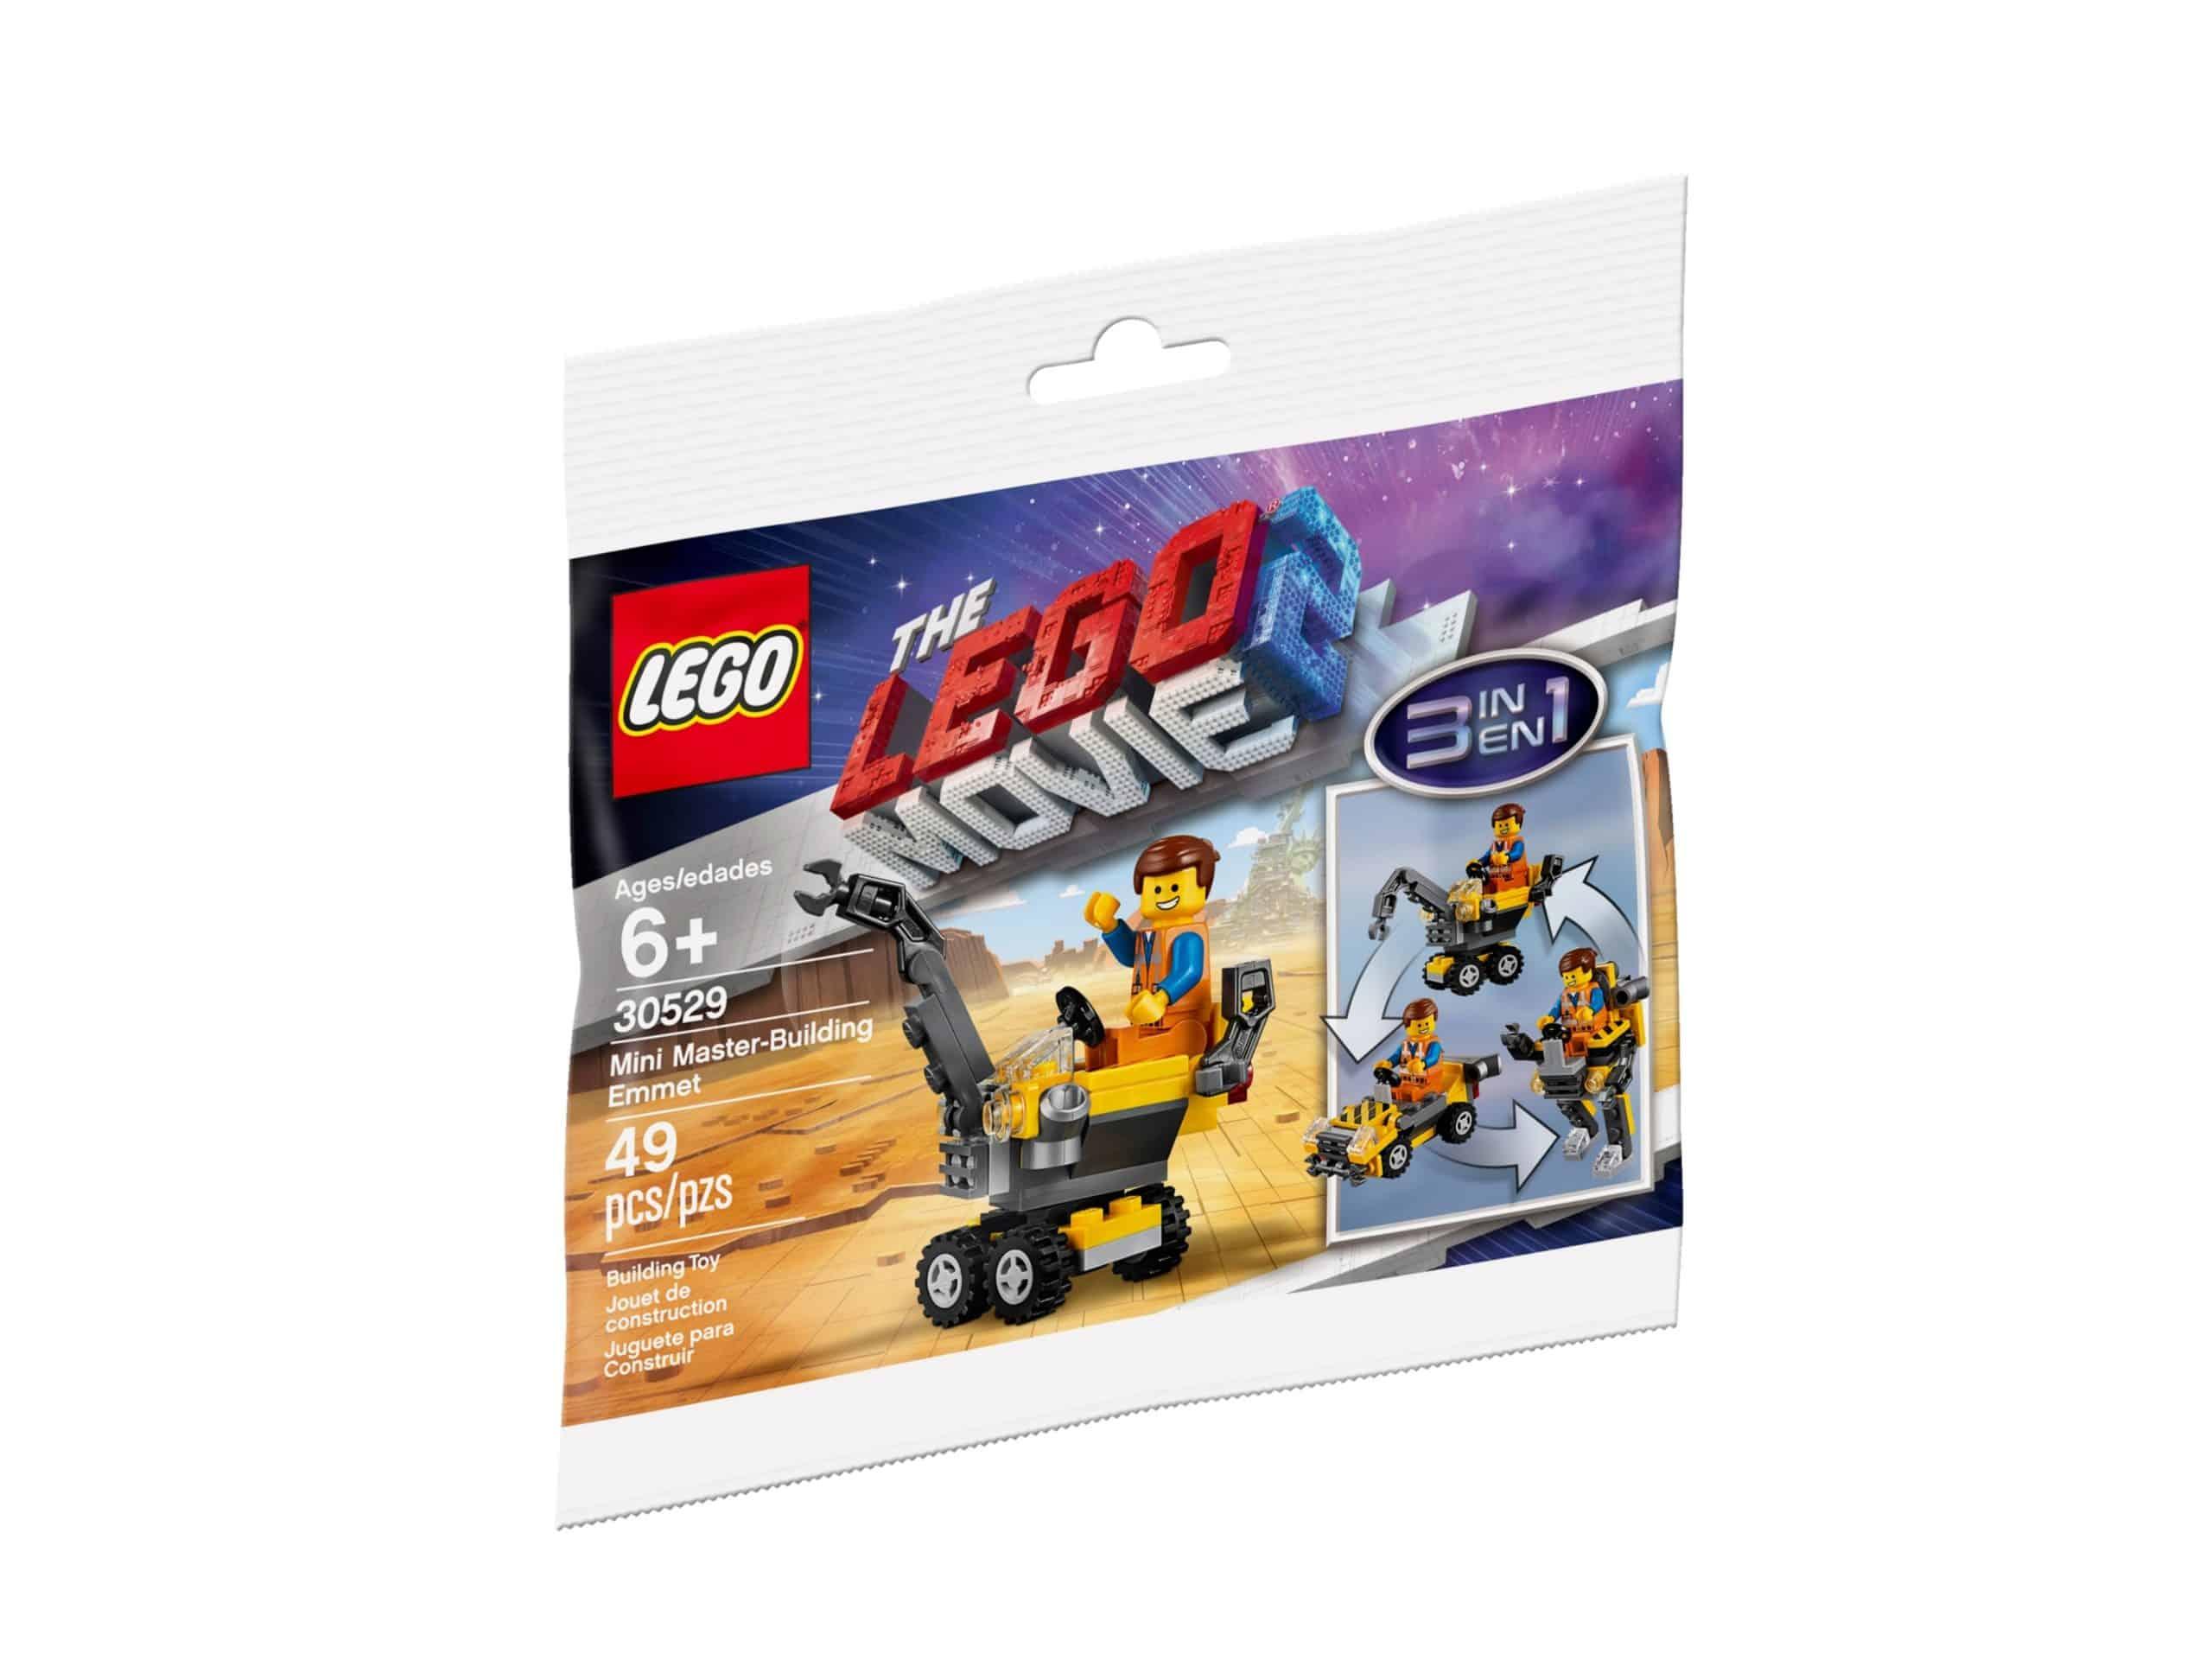 lego 30529 mini mesterbygger emmet scaled